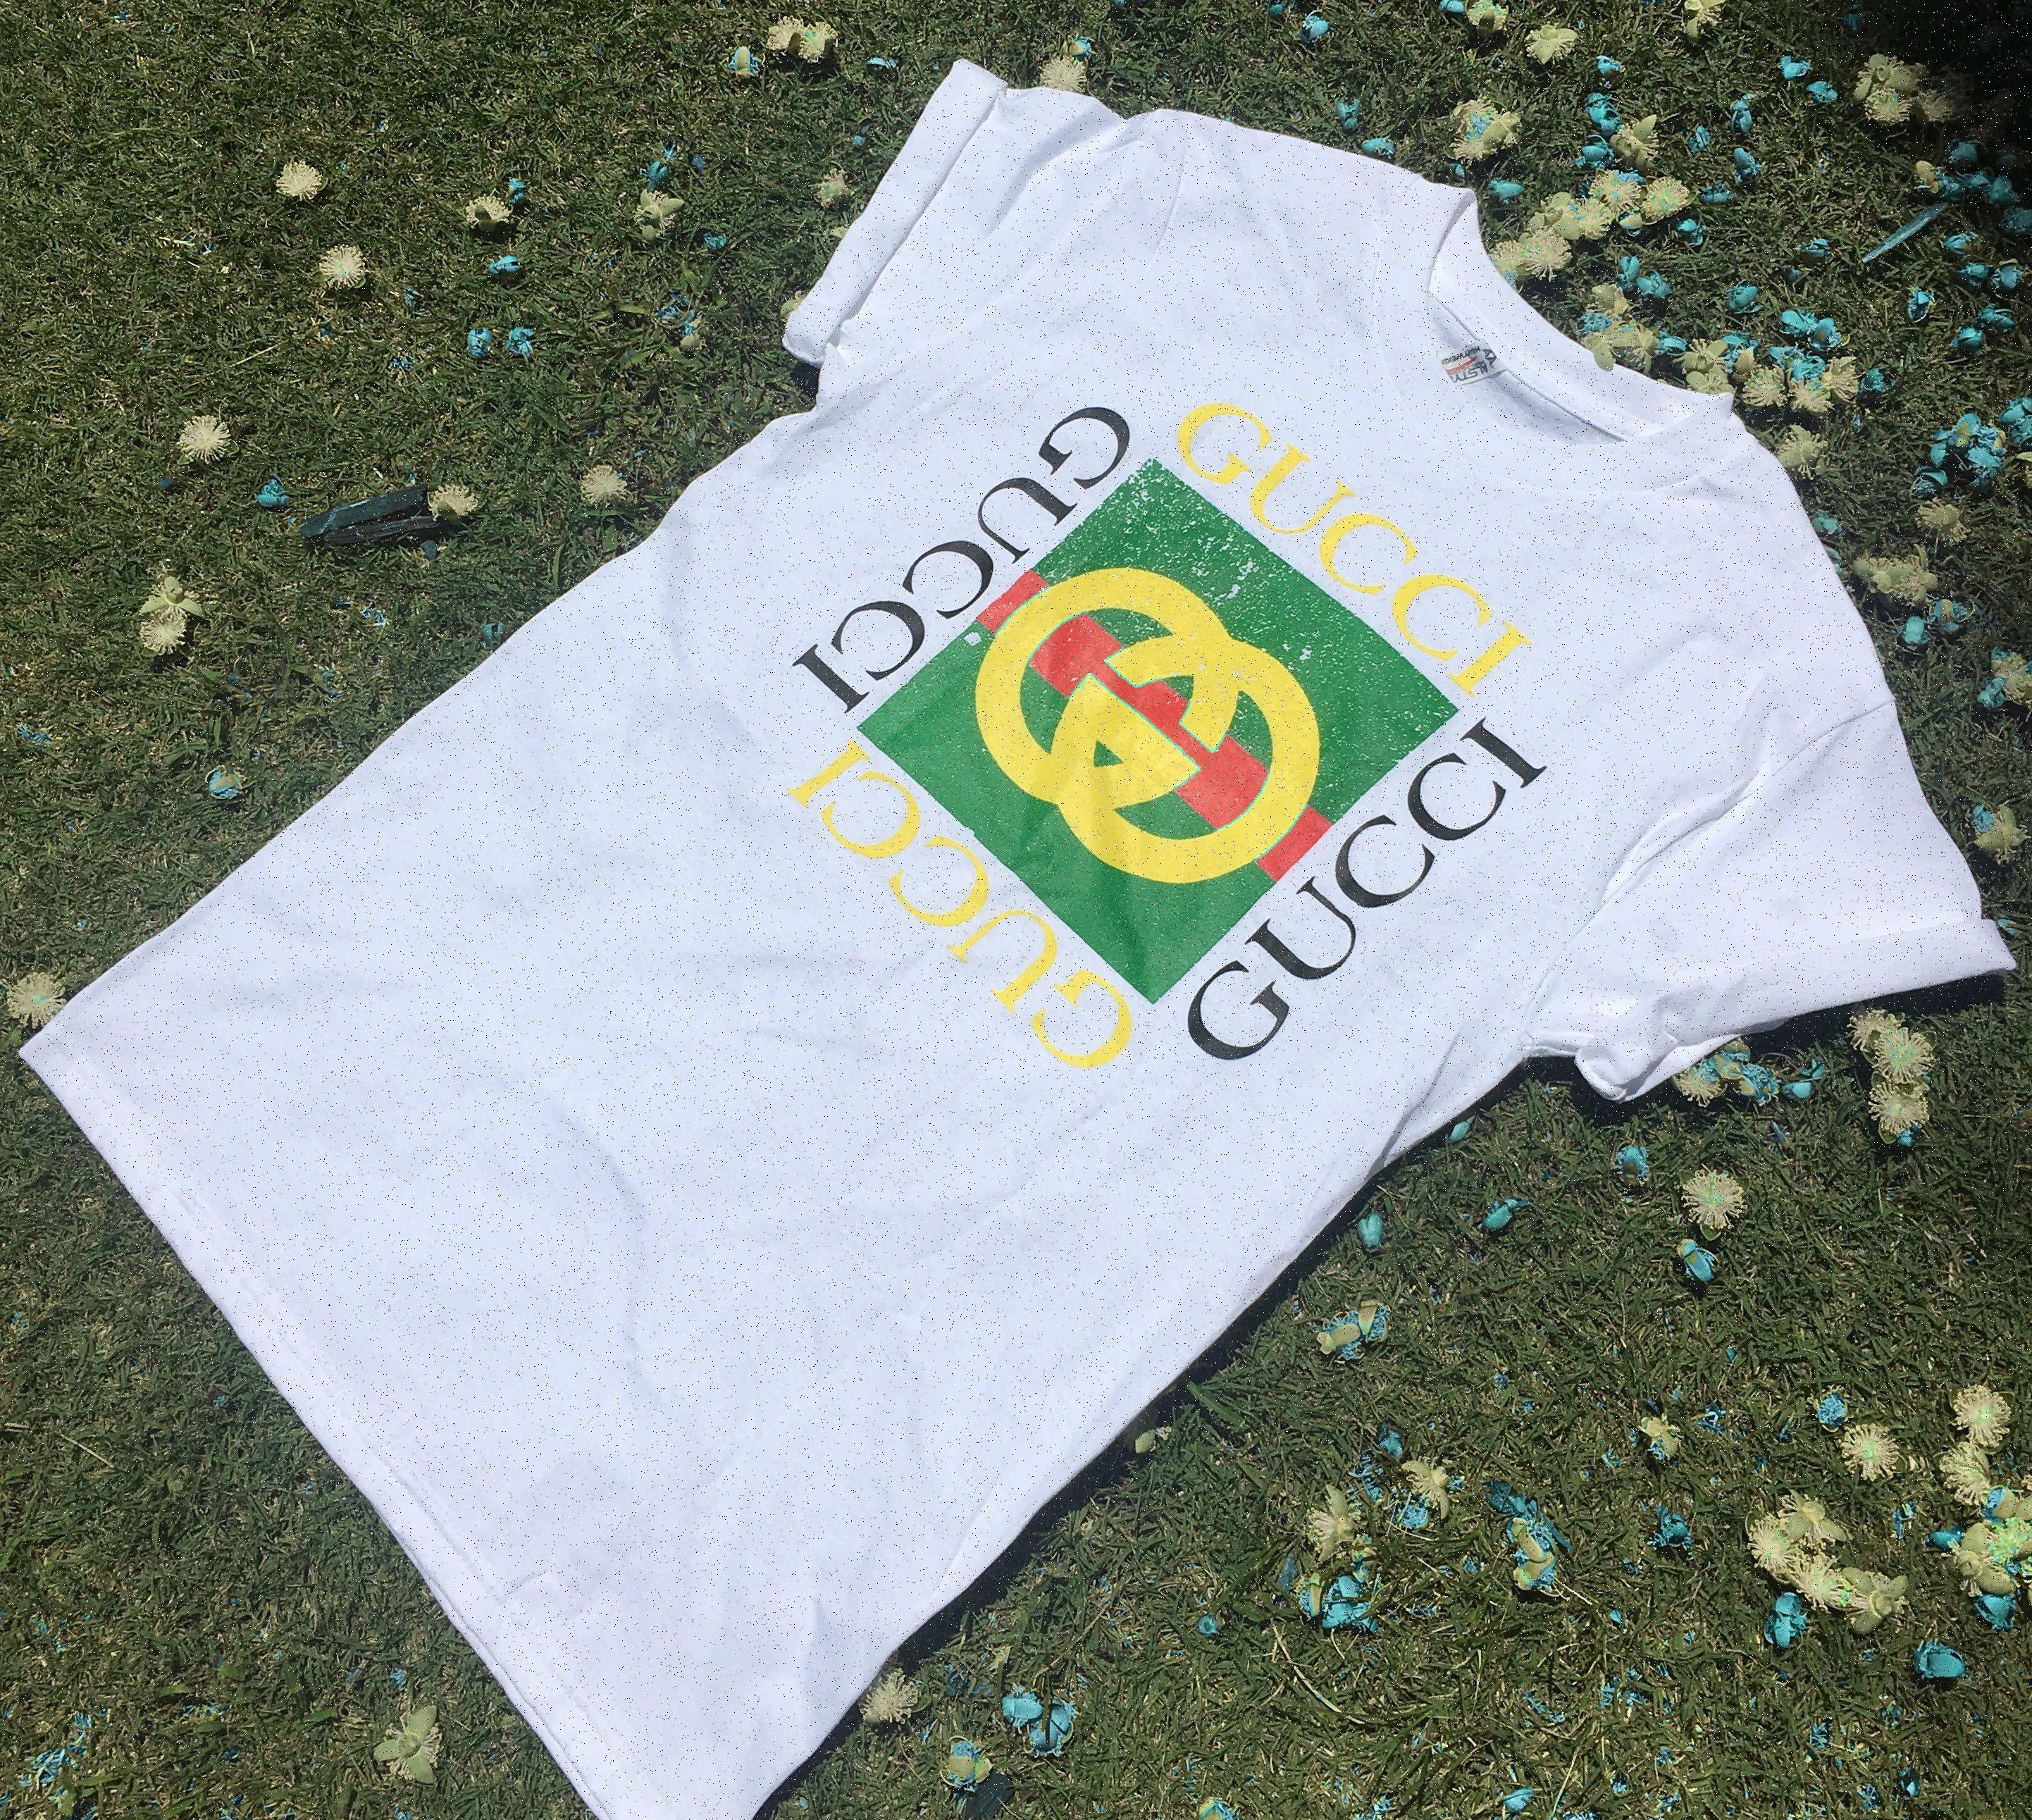 Vintage Gucci Bootleg T Shirt Vintage Gucci Shirts Gucci